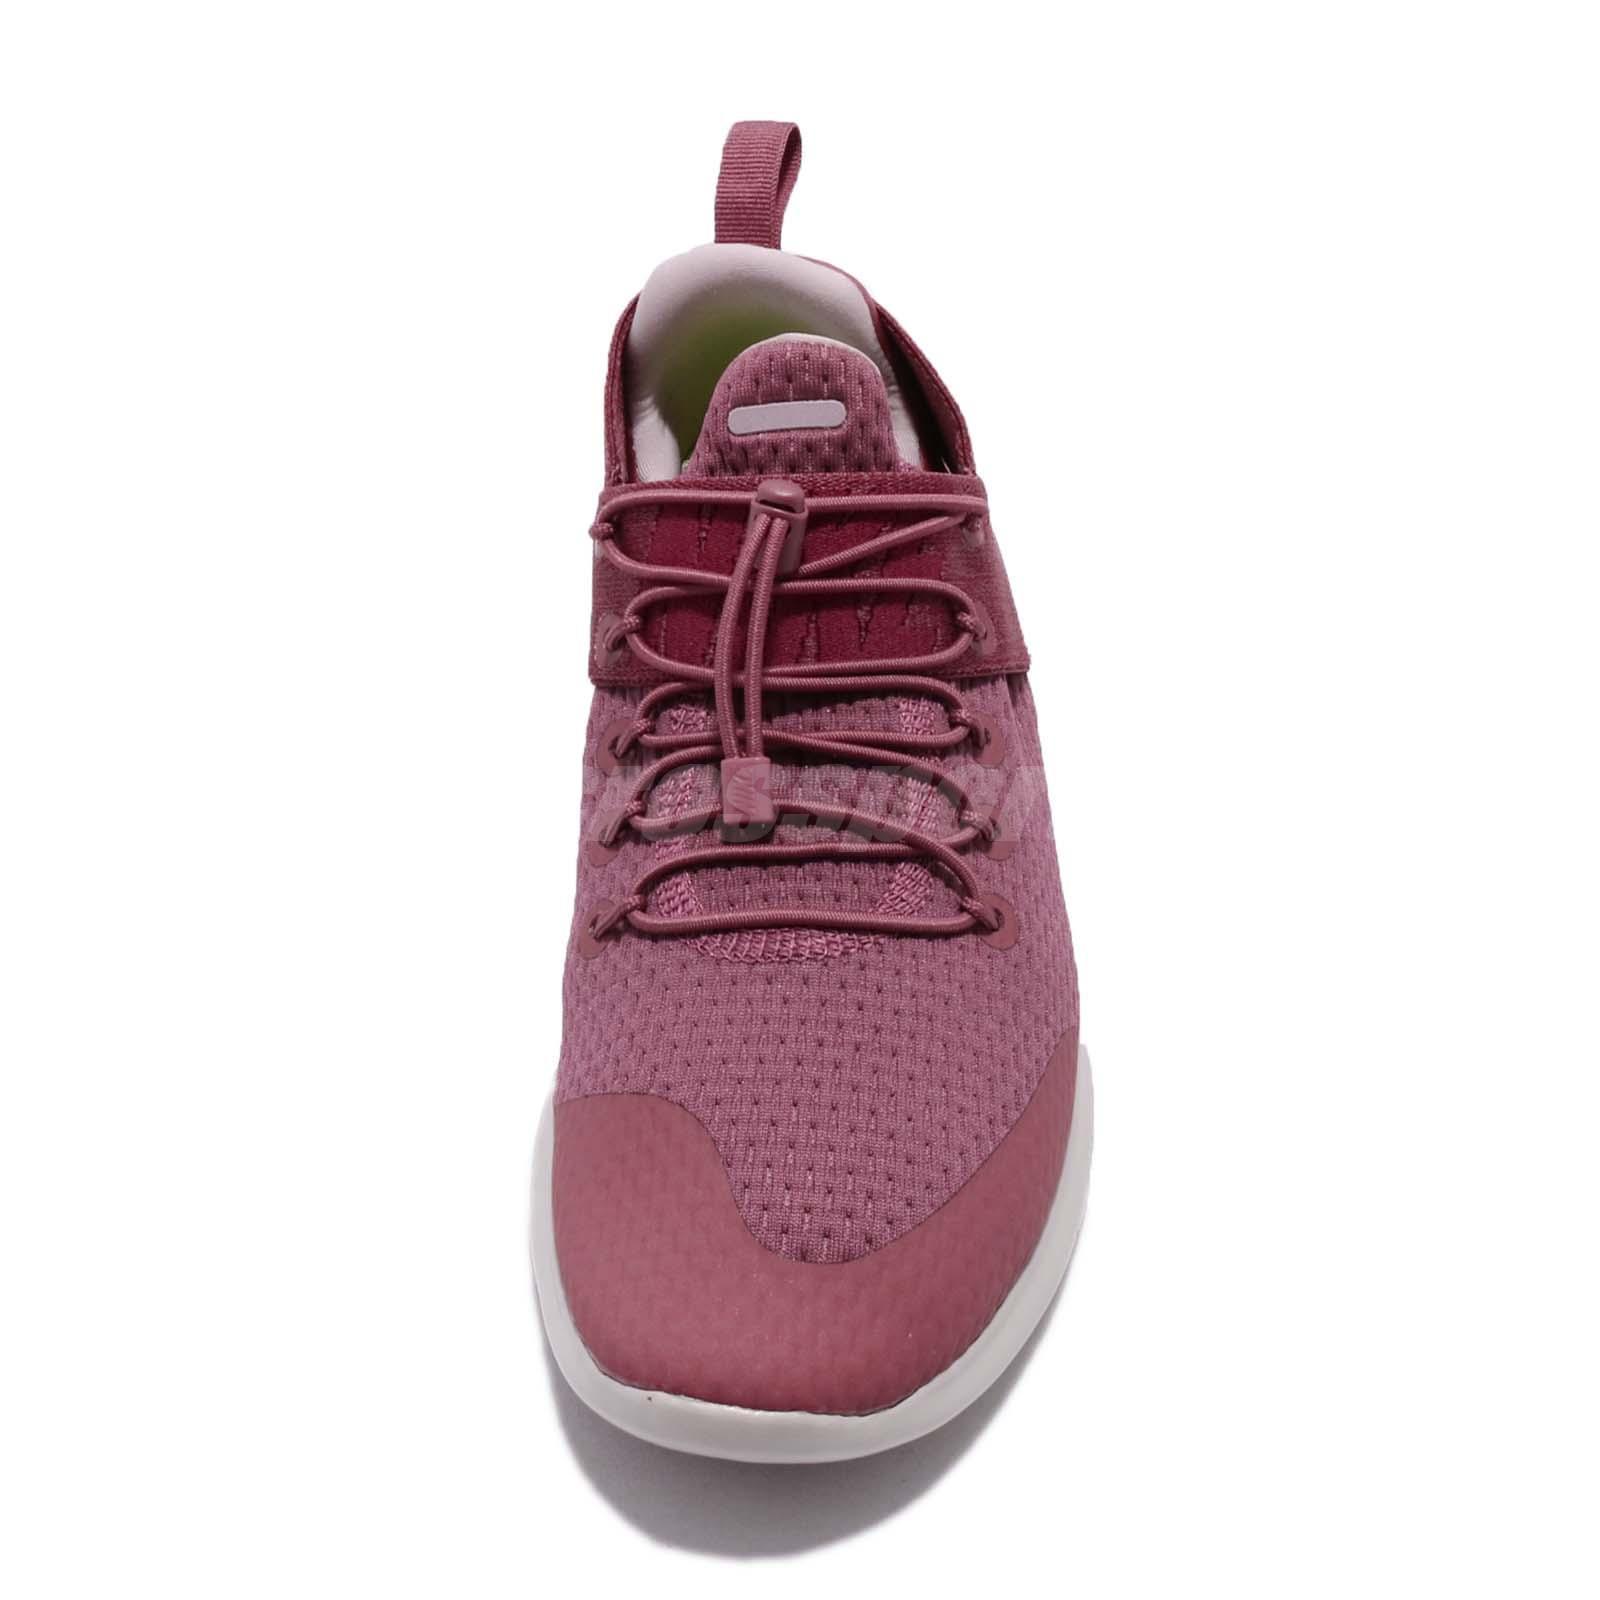 6e80ec9b4ff1 Wmns Nike Free RN CMTR 2017 Fun Vintage Wine Red Women Running Shoes ...